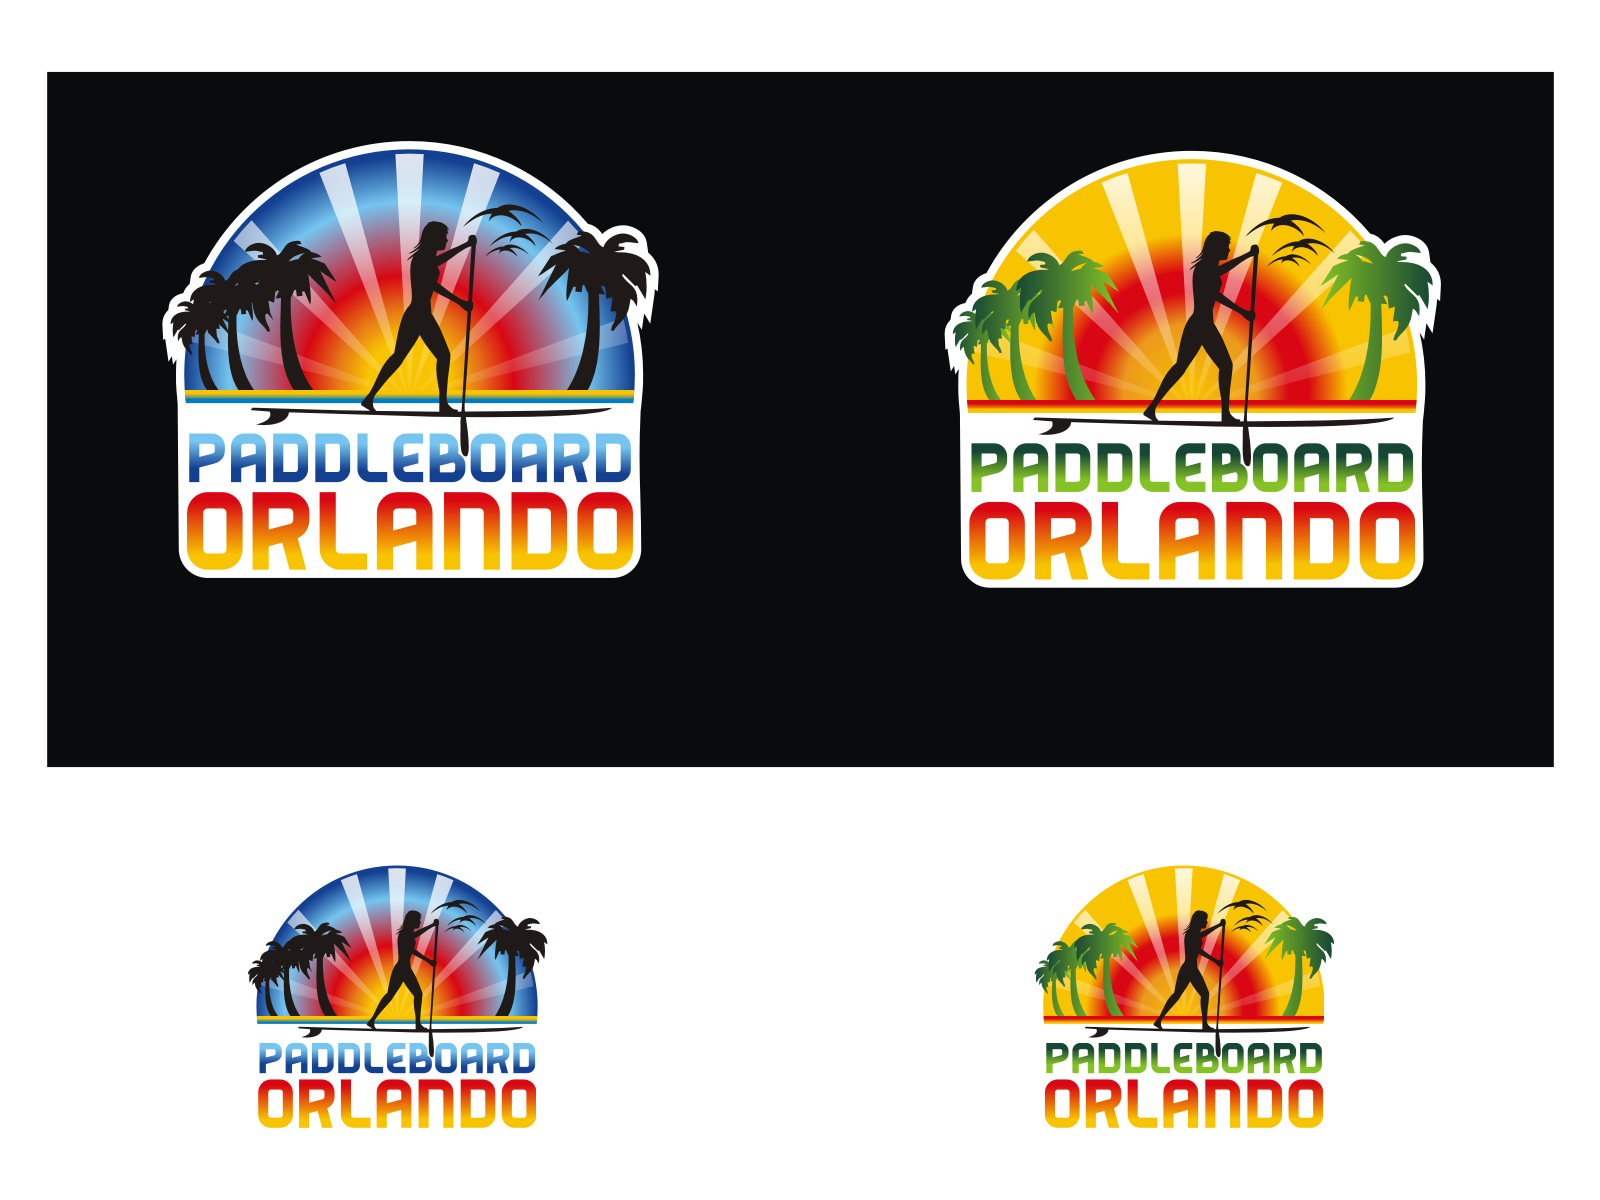 Create the next logo for Paddleboard Orlando